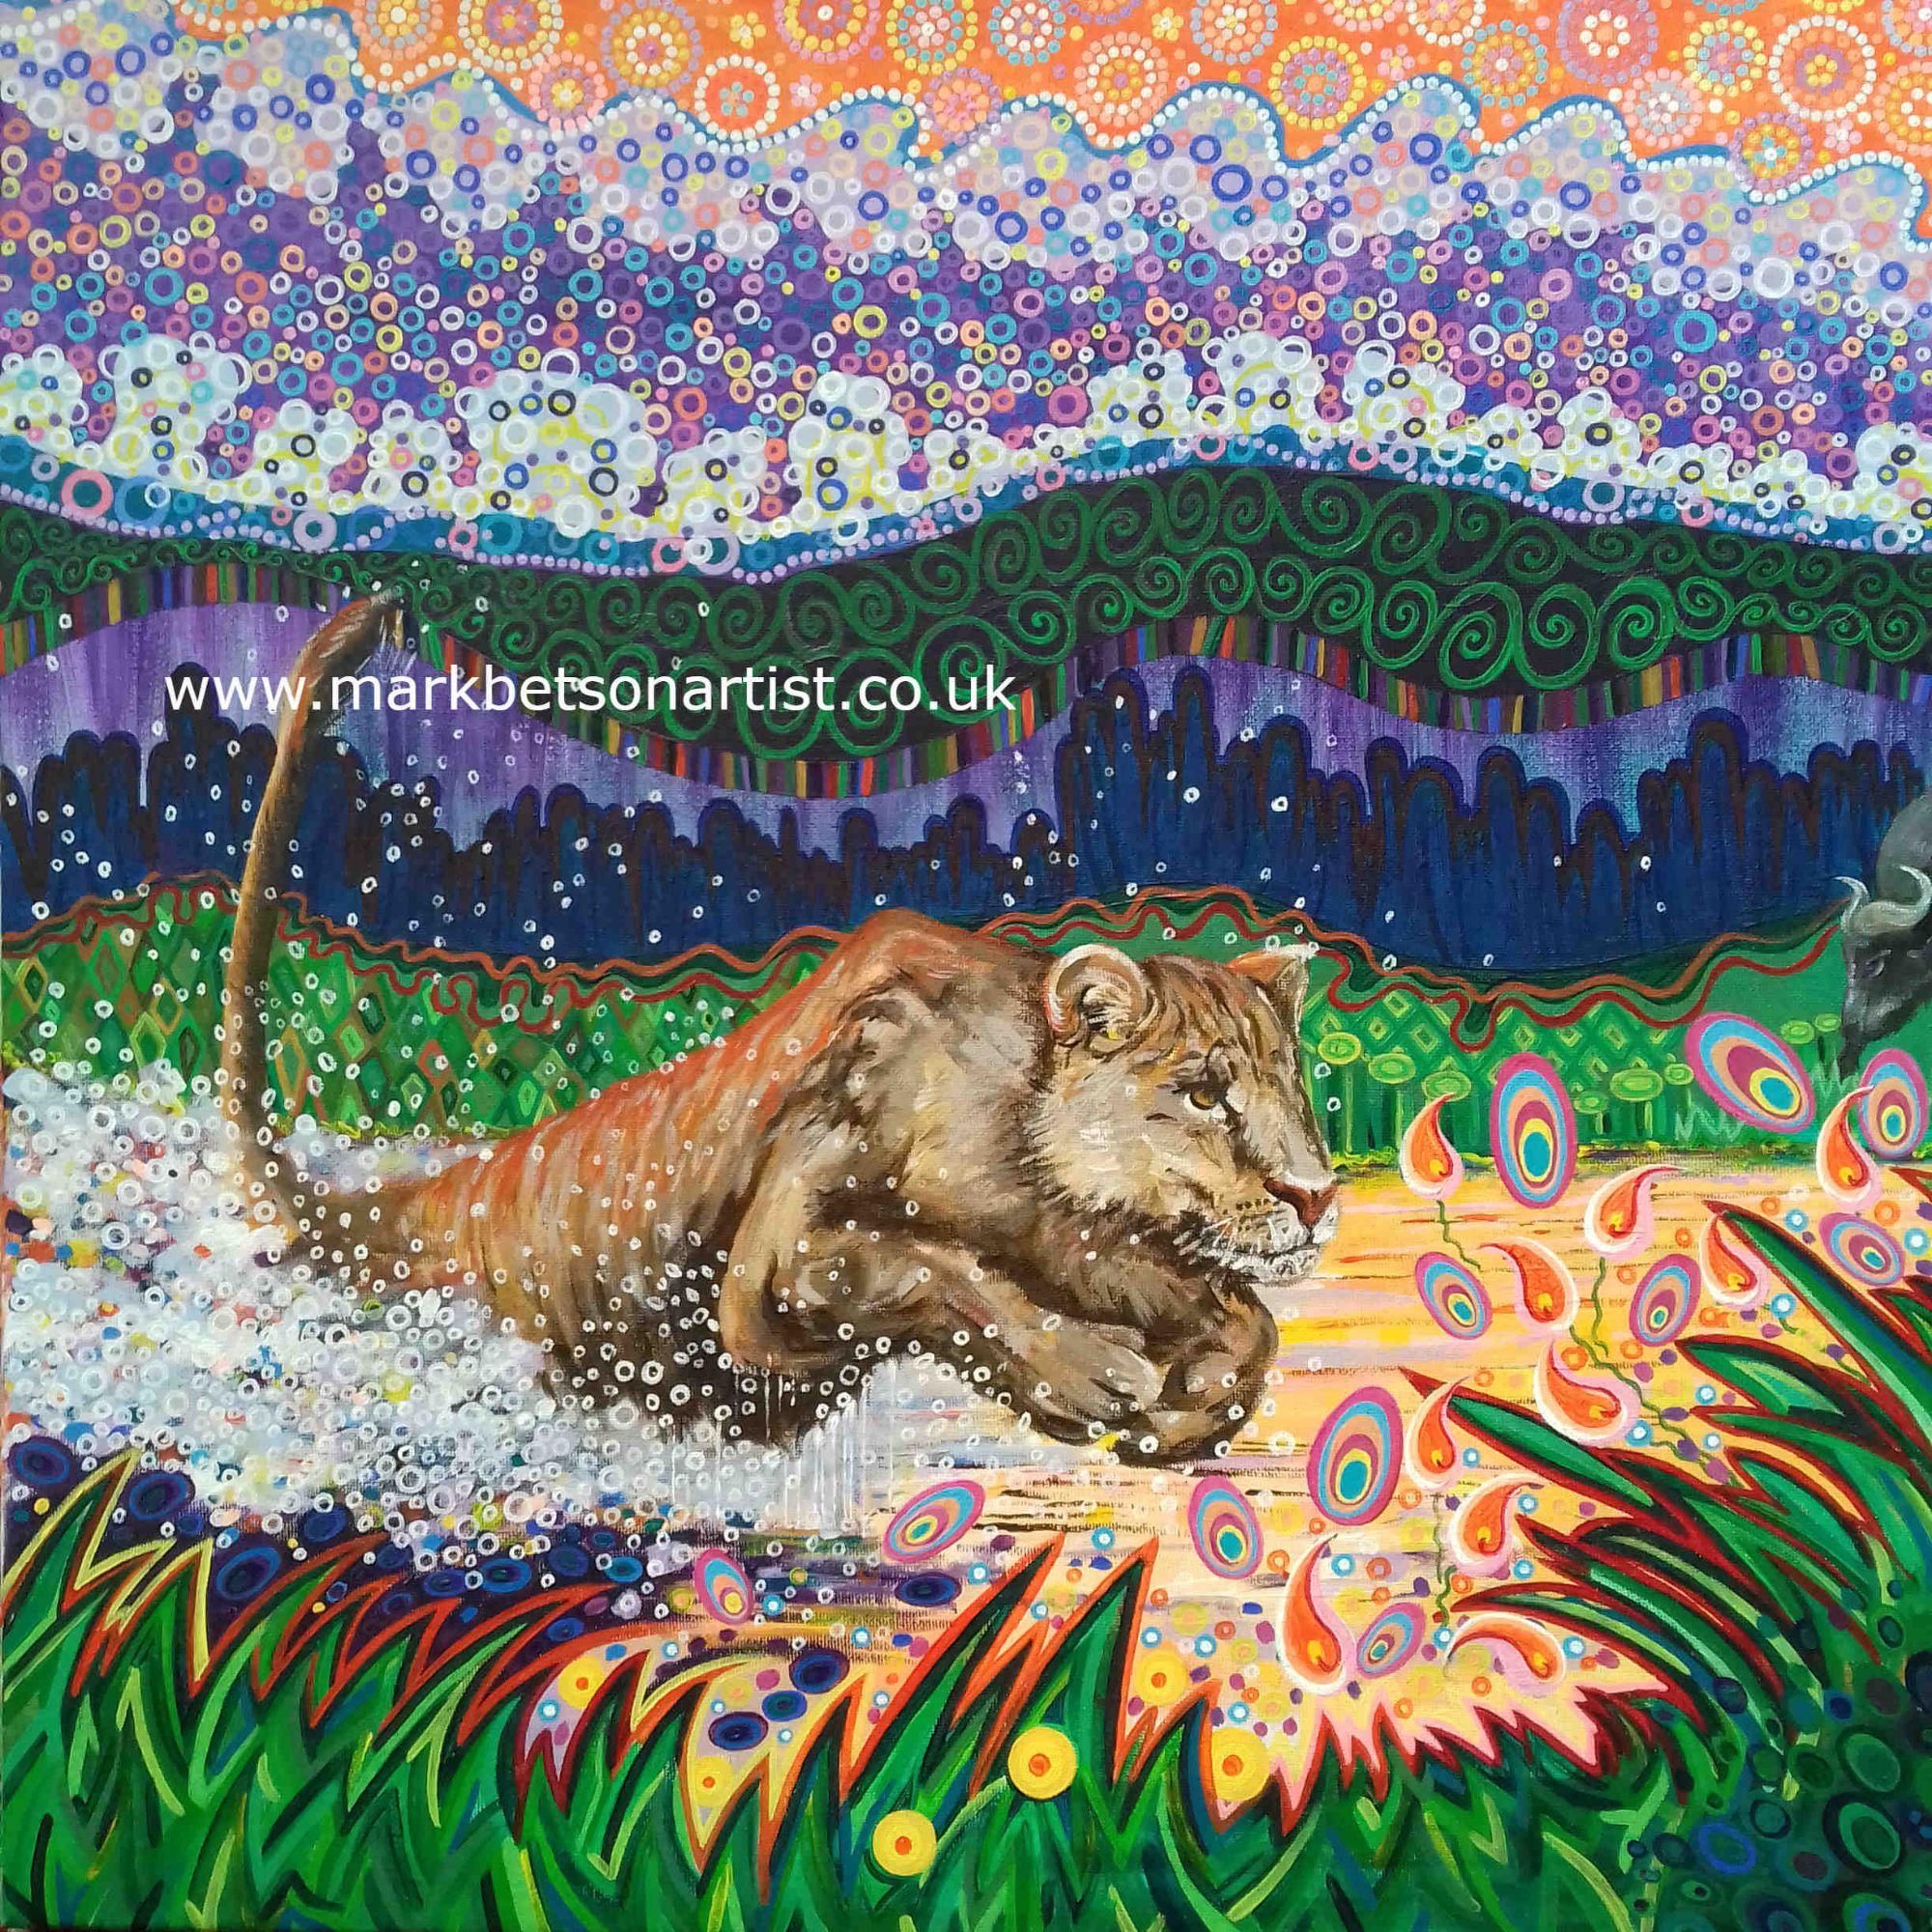 Lioness bby Mark Betson Artist